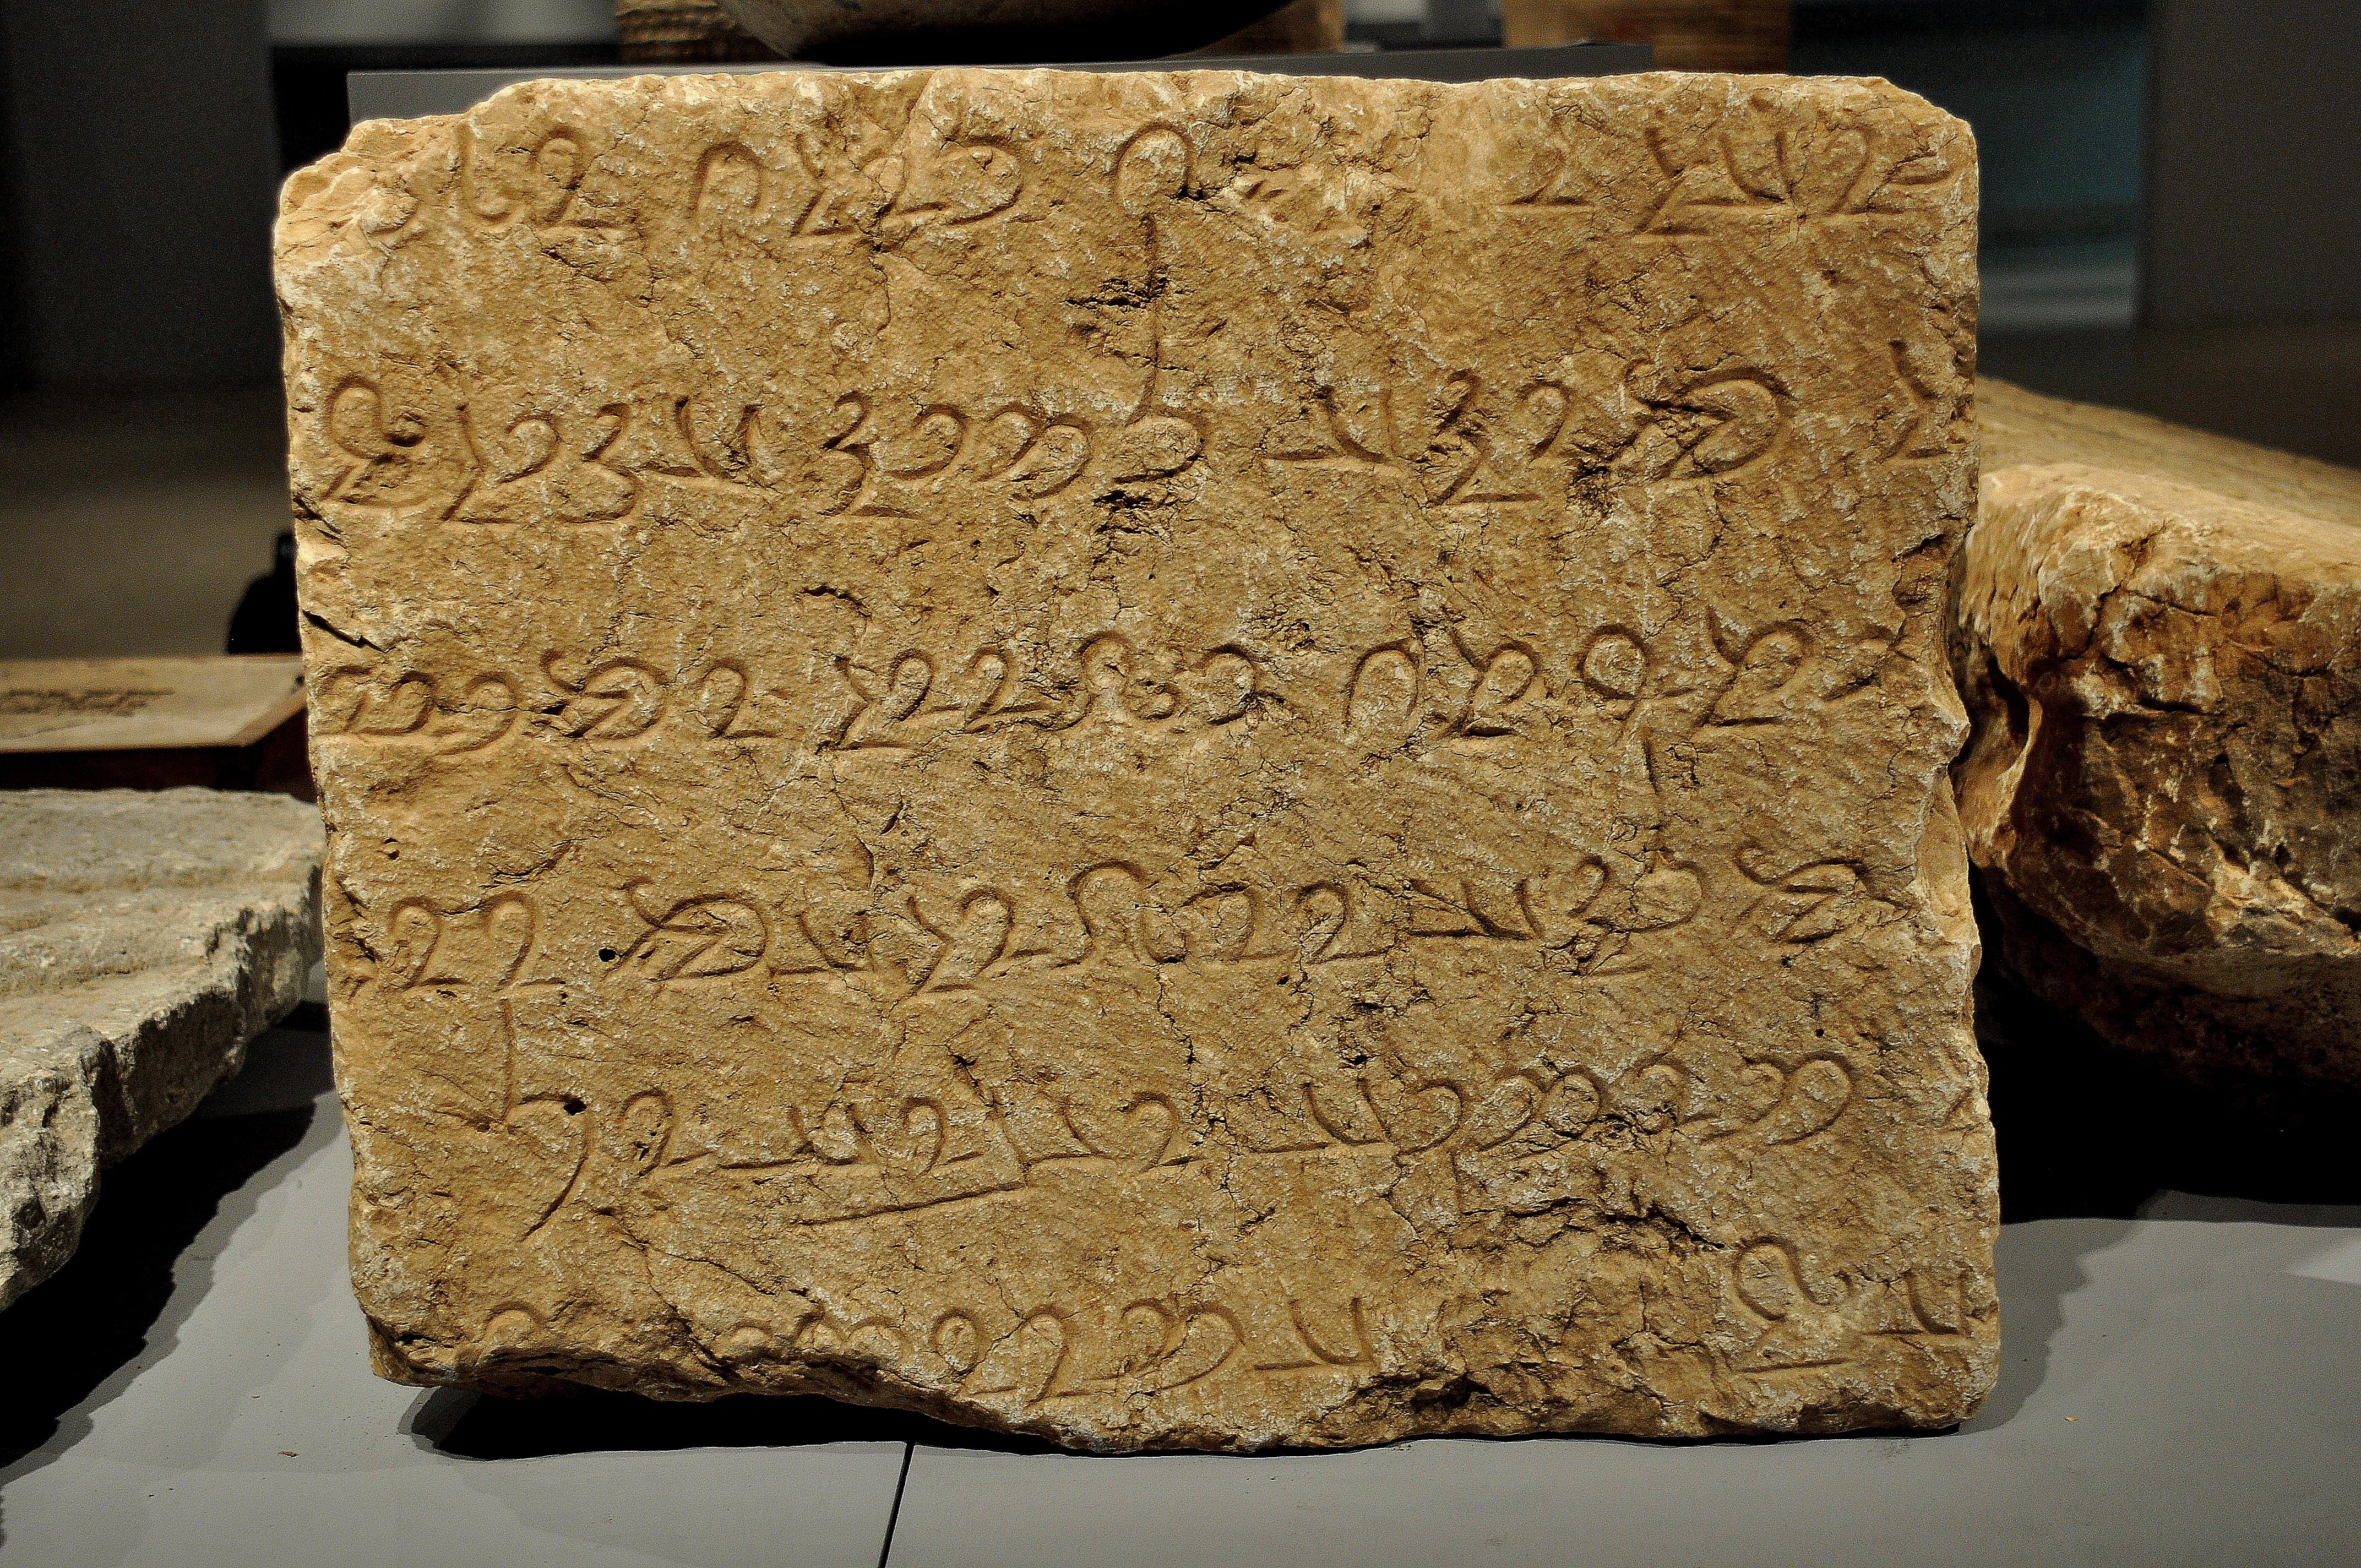 File:Stone block with Paikuli inscription JPG - Wikimedia